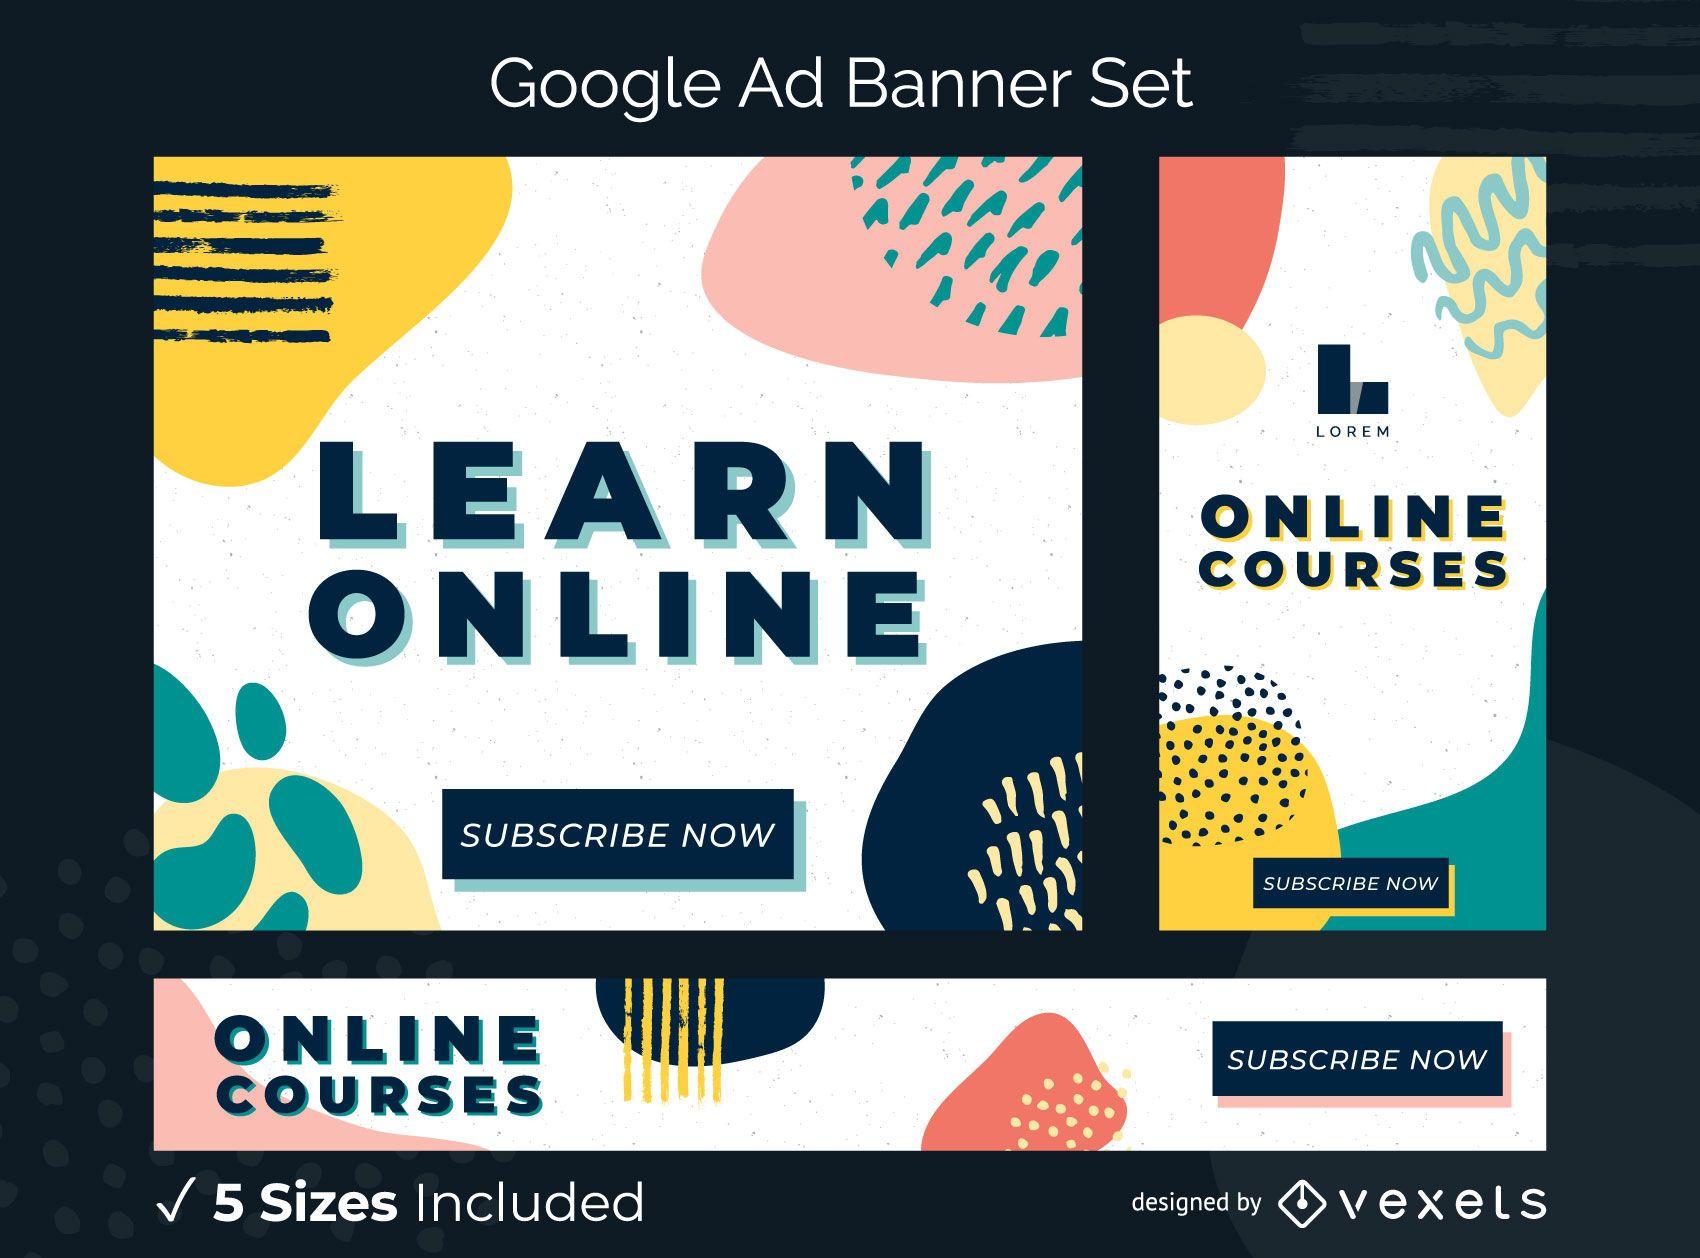 Aprenda o conjunto de banners de anúncios online